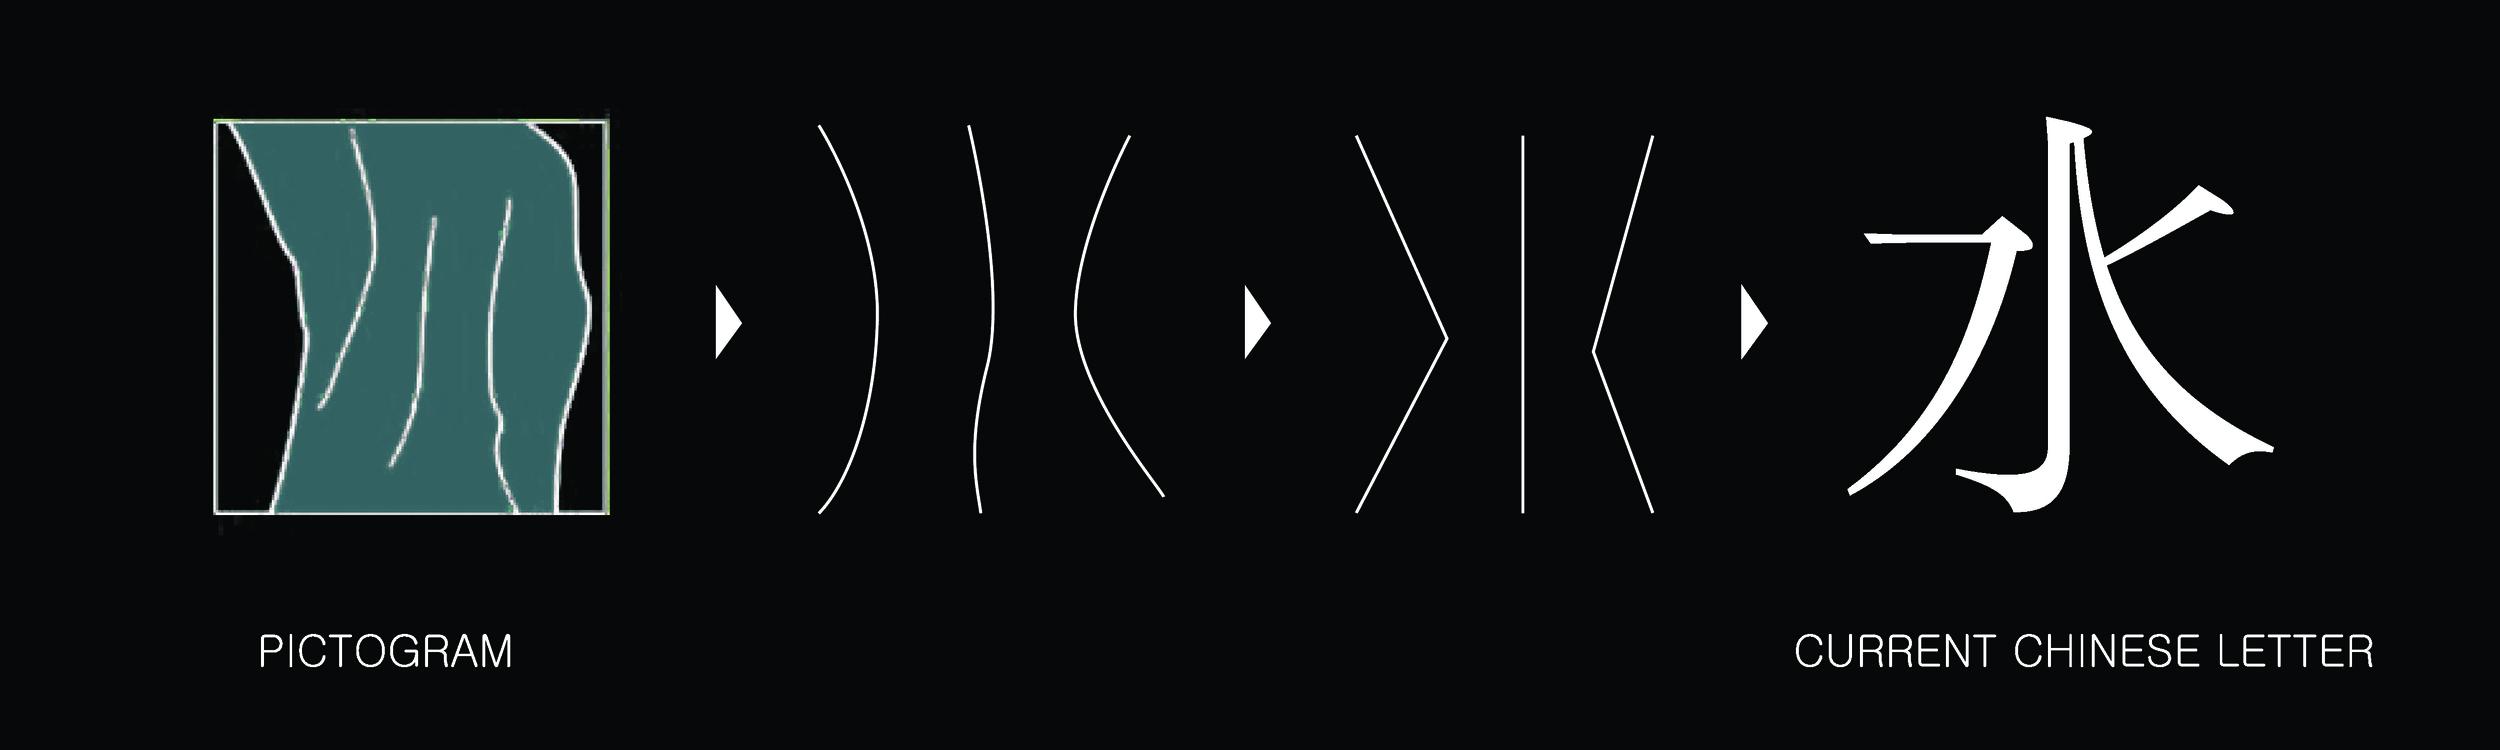 01.Binder1-1-edit.jpg